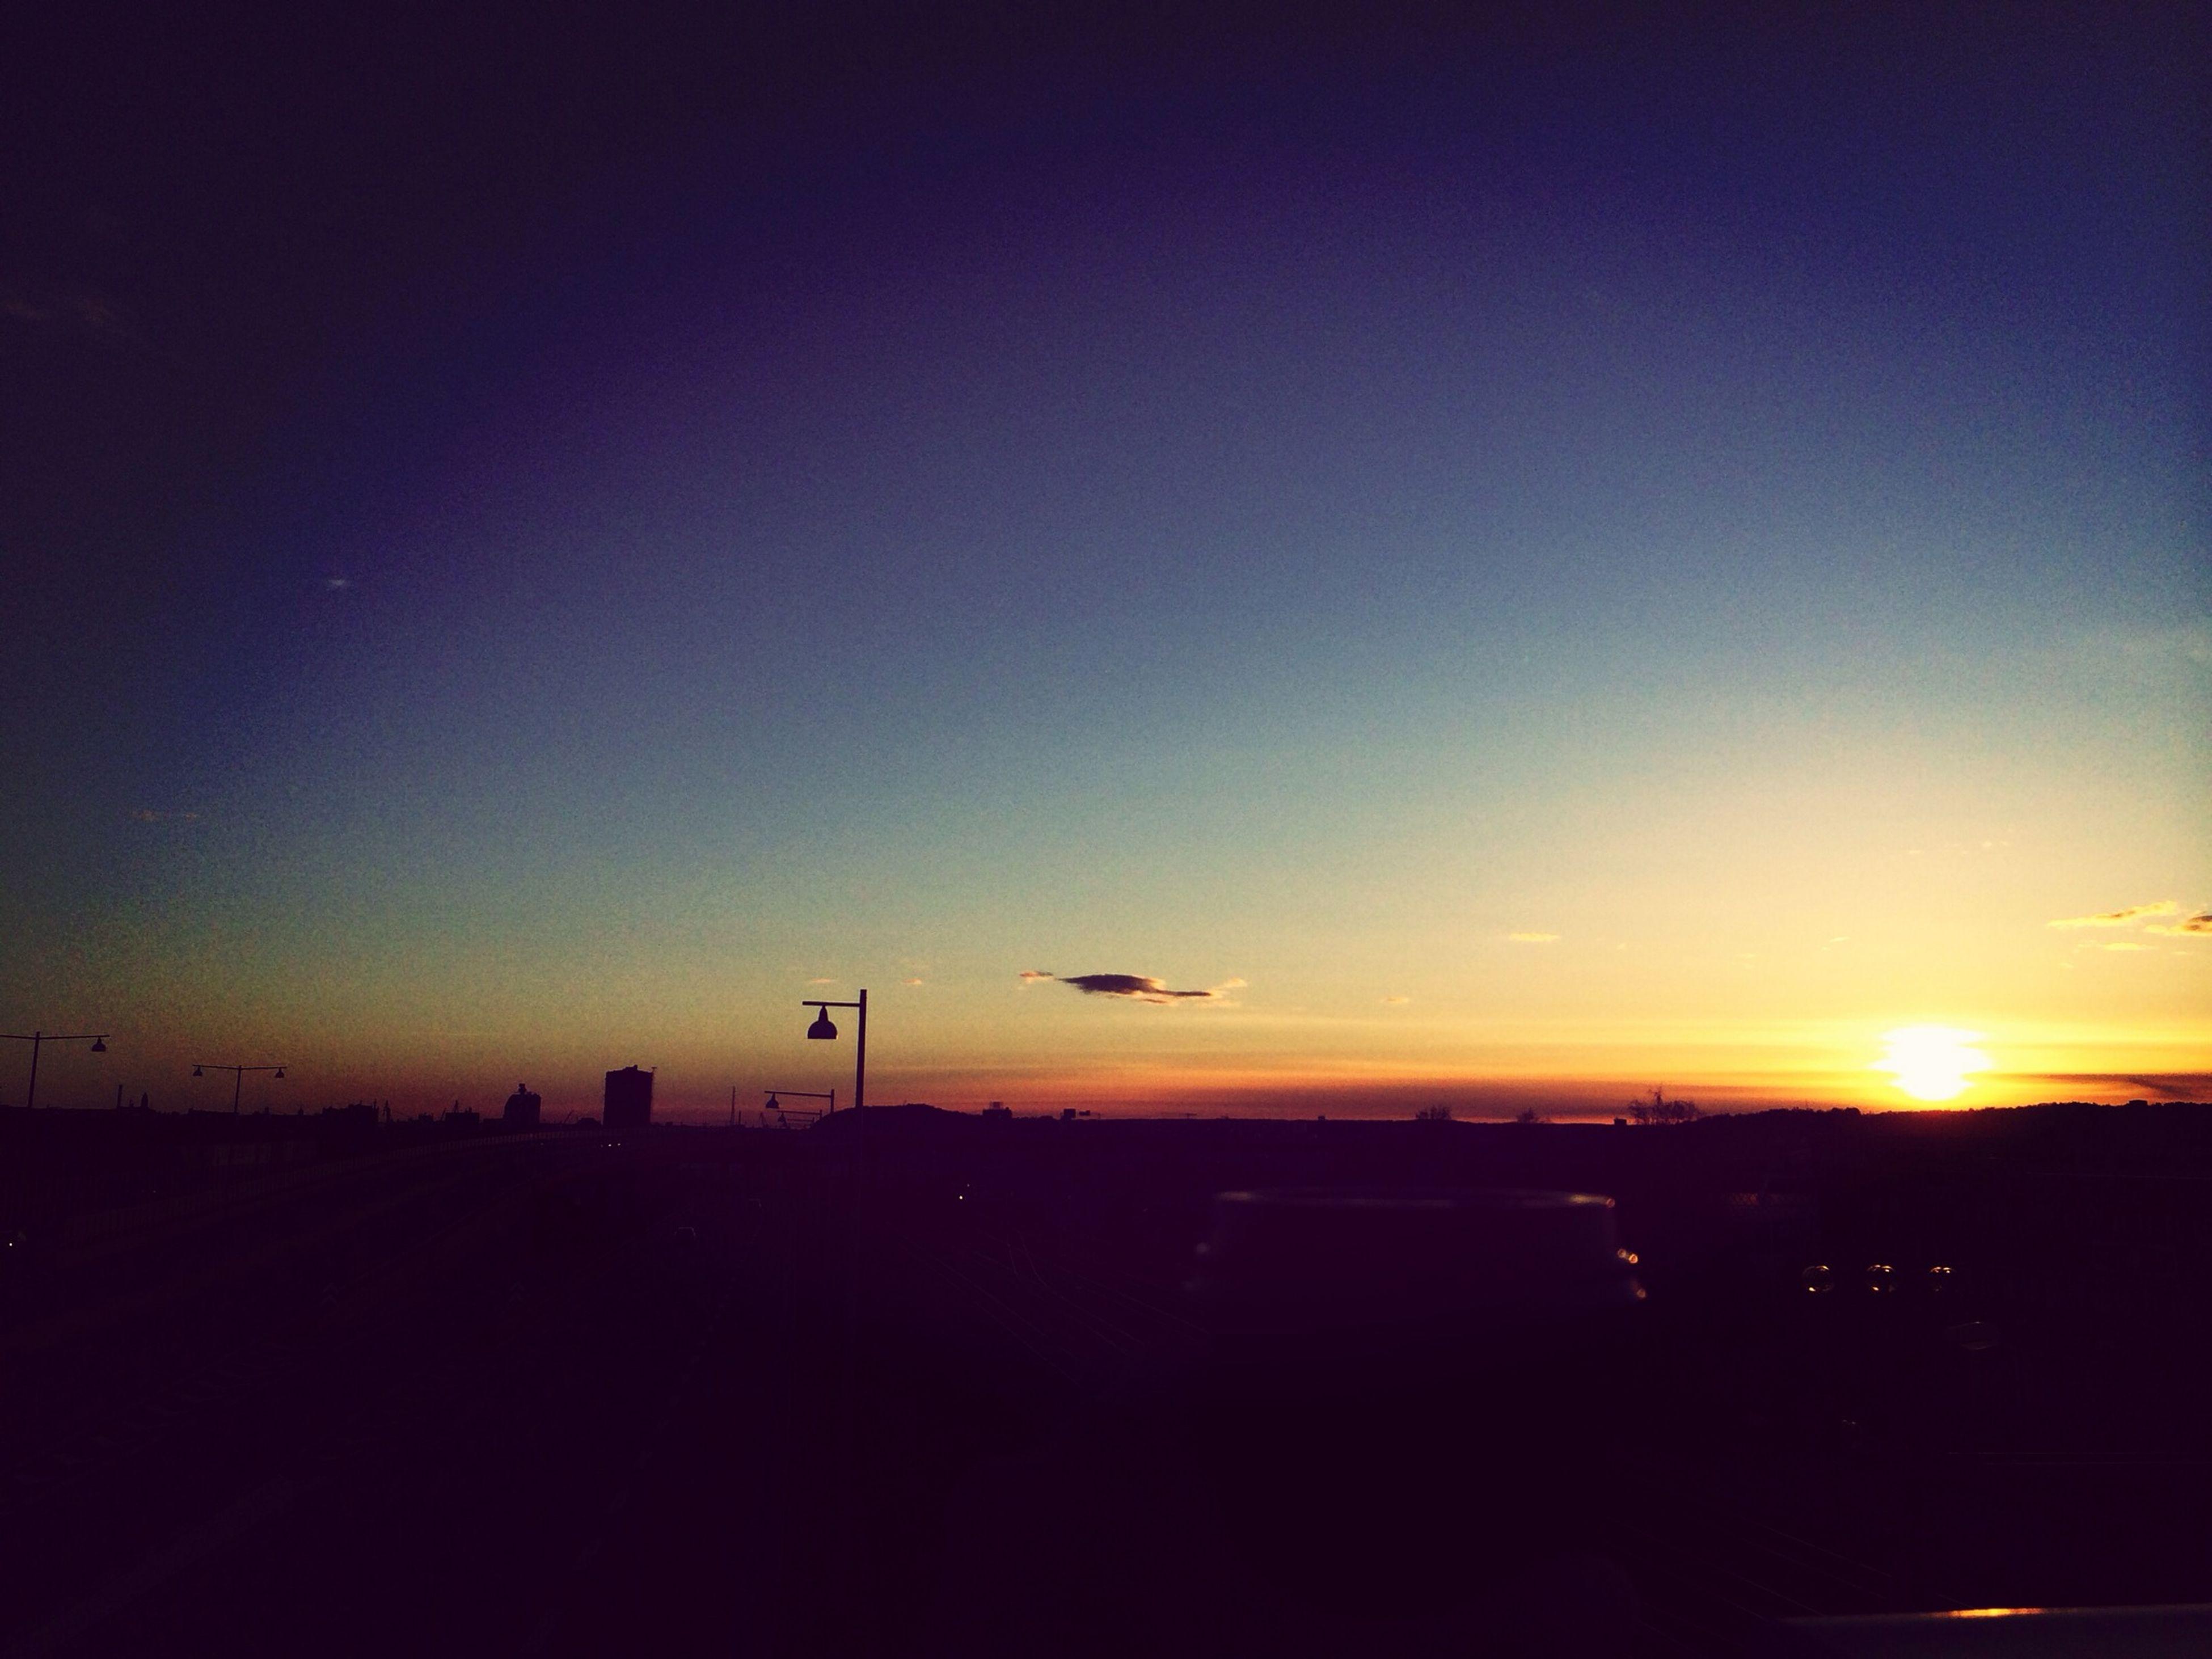 sunset, silhouette, copy space, orange color, scenics, landscape, sun, clear sky, transportation, tranquil scene, beauty in nature, tranquility, nature, sky, dusk, dark, mode of transport, idyllic, horizon over land, outdoors